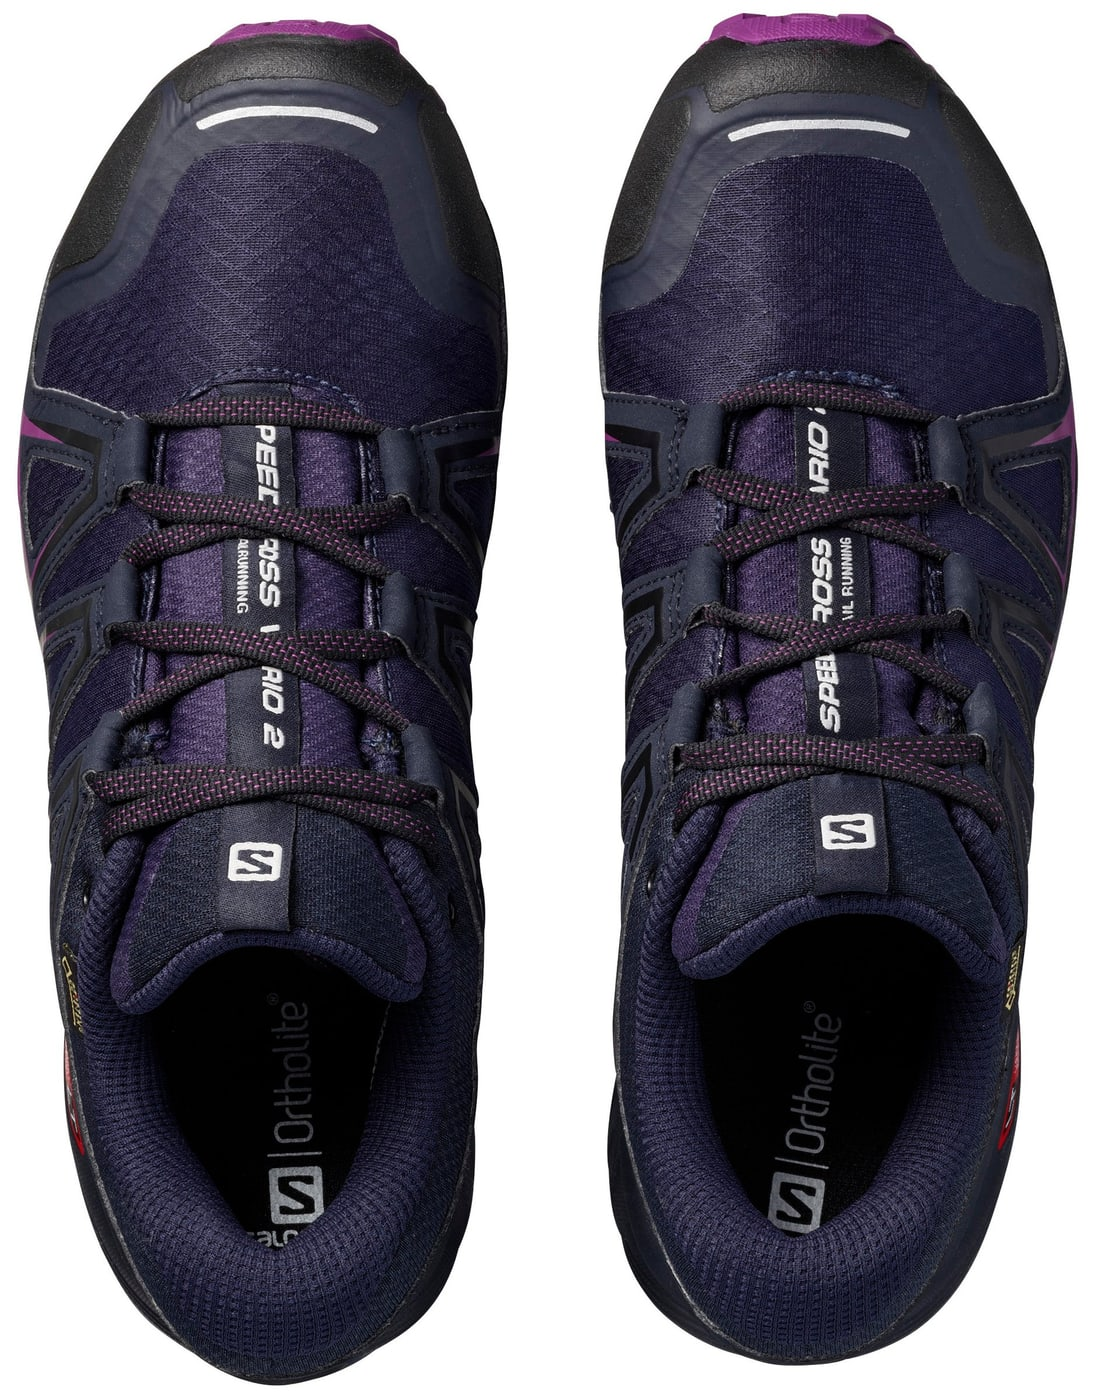 Vario Chaussures 2 Gtx Speedcross Femme Pour Polyvalentes Salomon P5SwTxUqZ